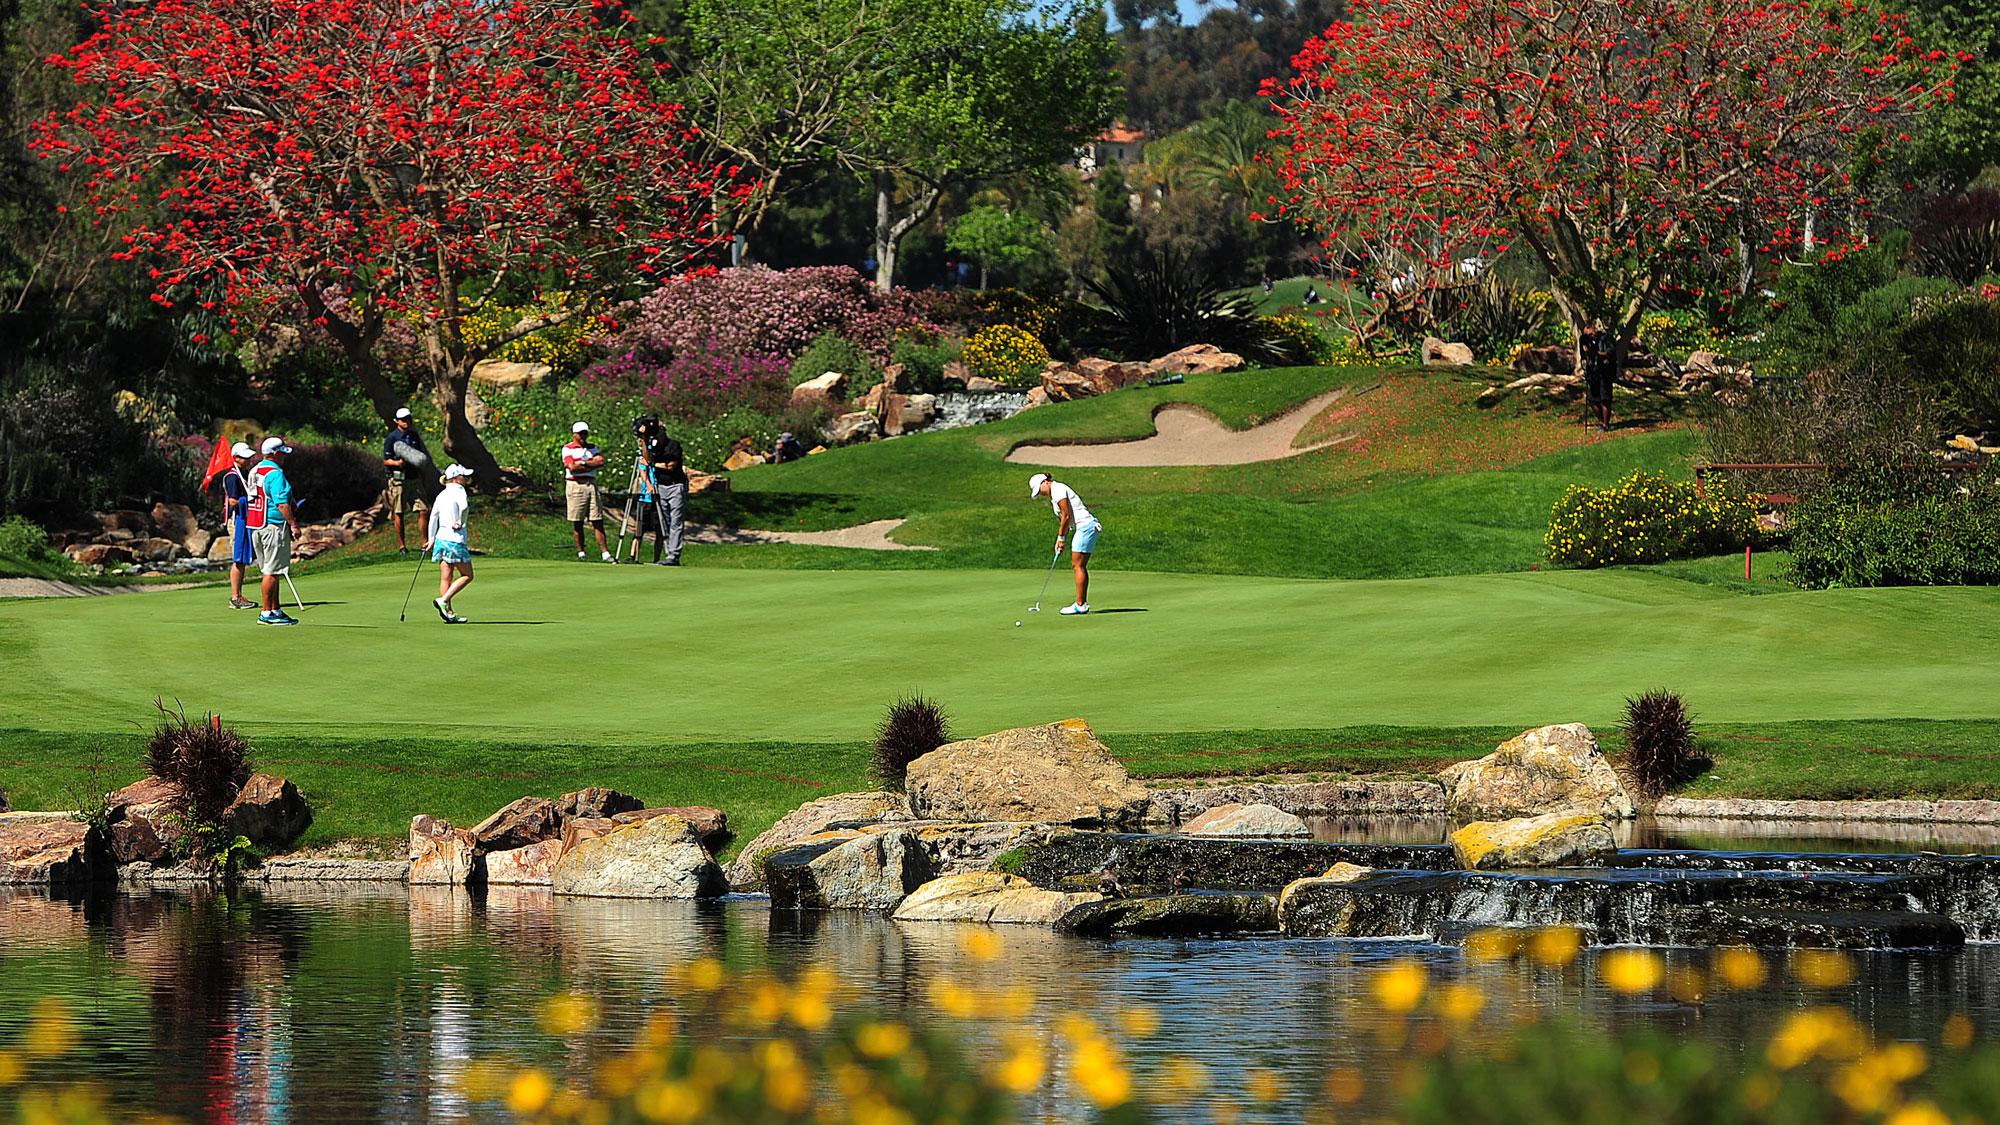 2019 Dow Great Lakes Bay Invitational partners with GEO Foundation | LPGA | Ladies Professional Golf Association